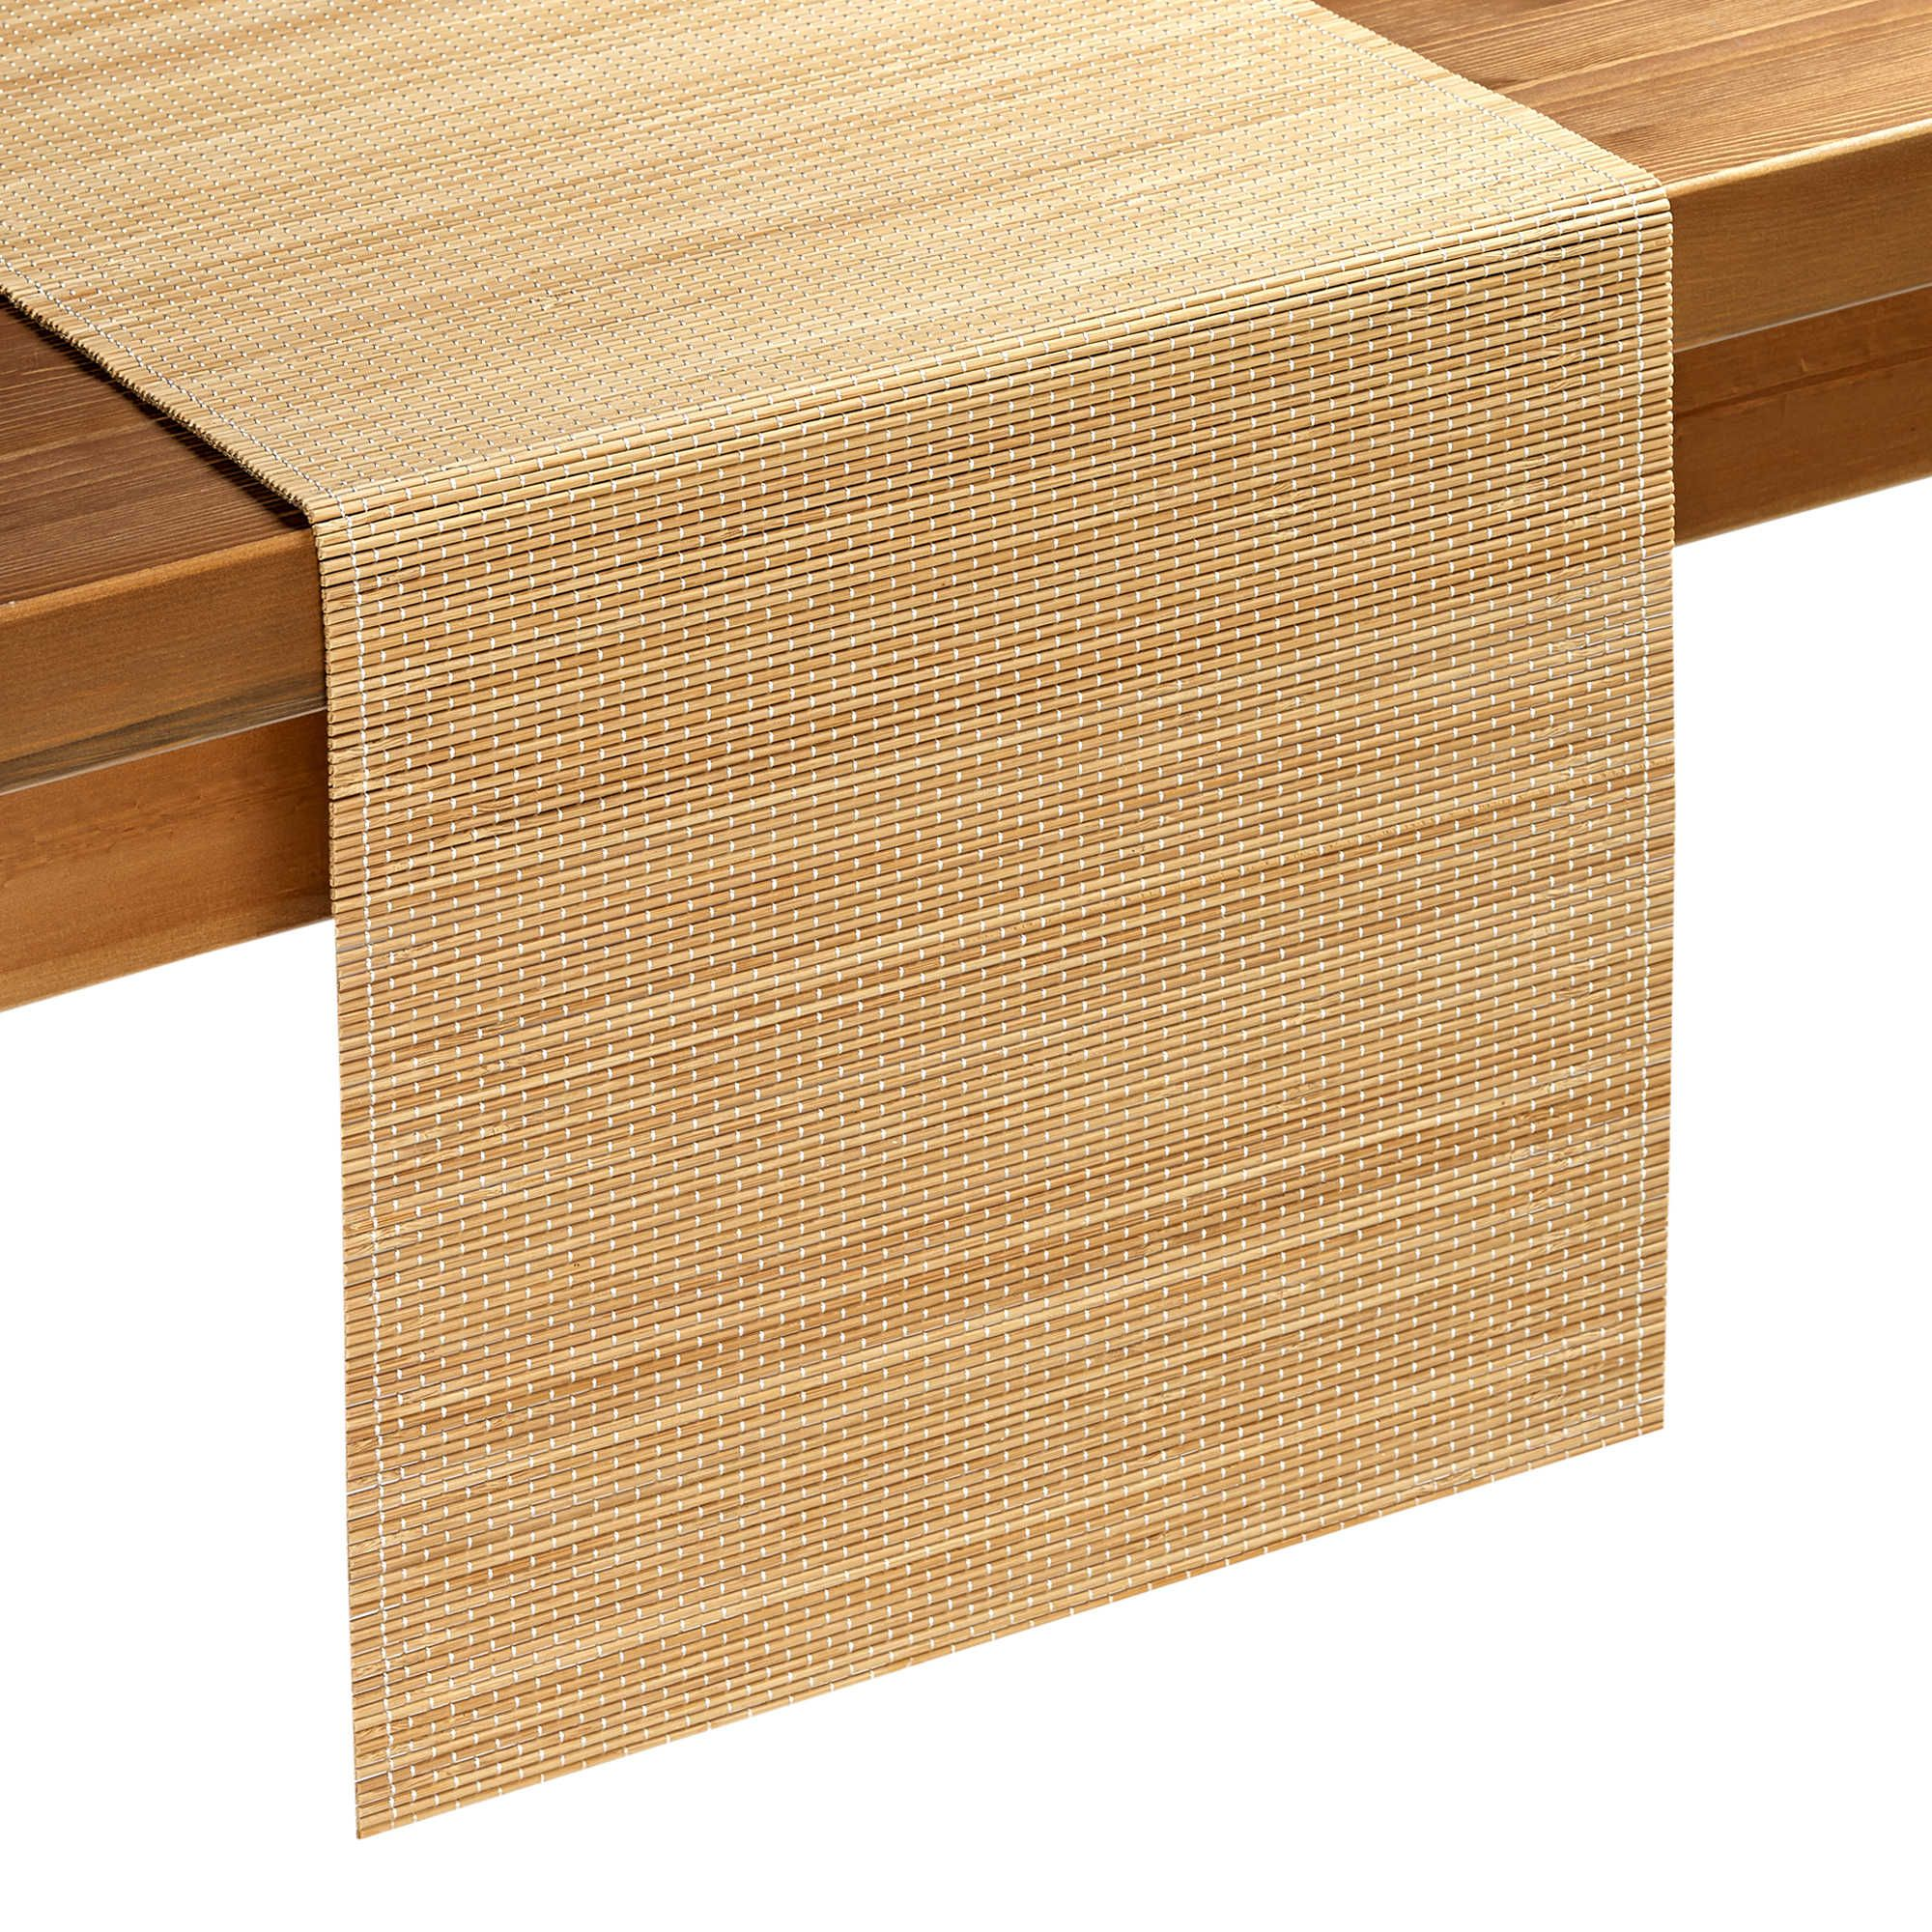 Bamboo Table Runner In Natural Bamboo Table Runner Bamboo